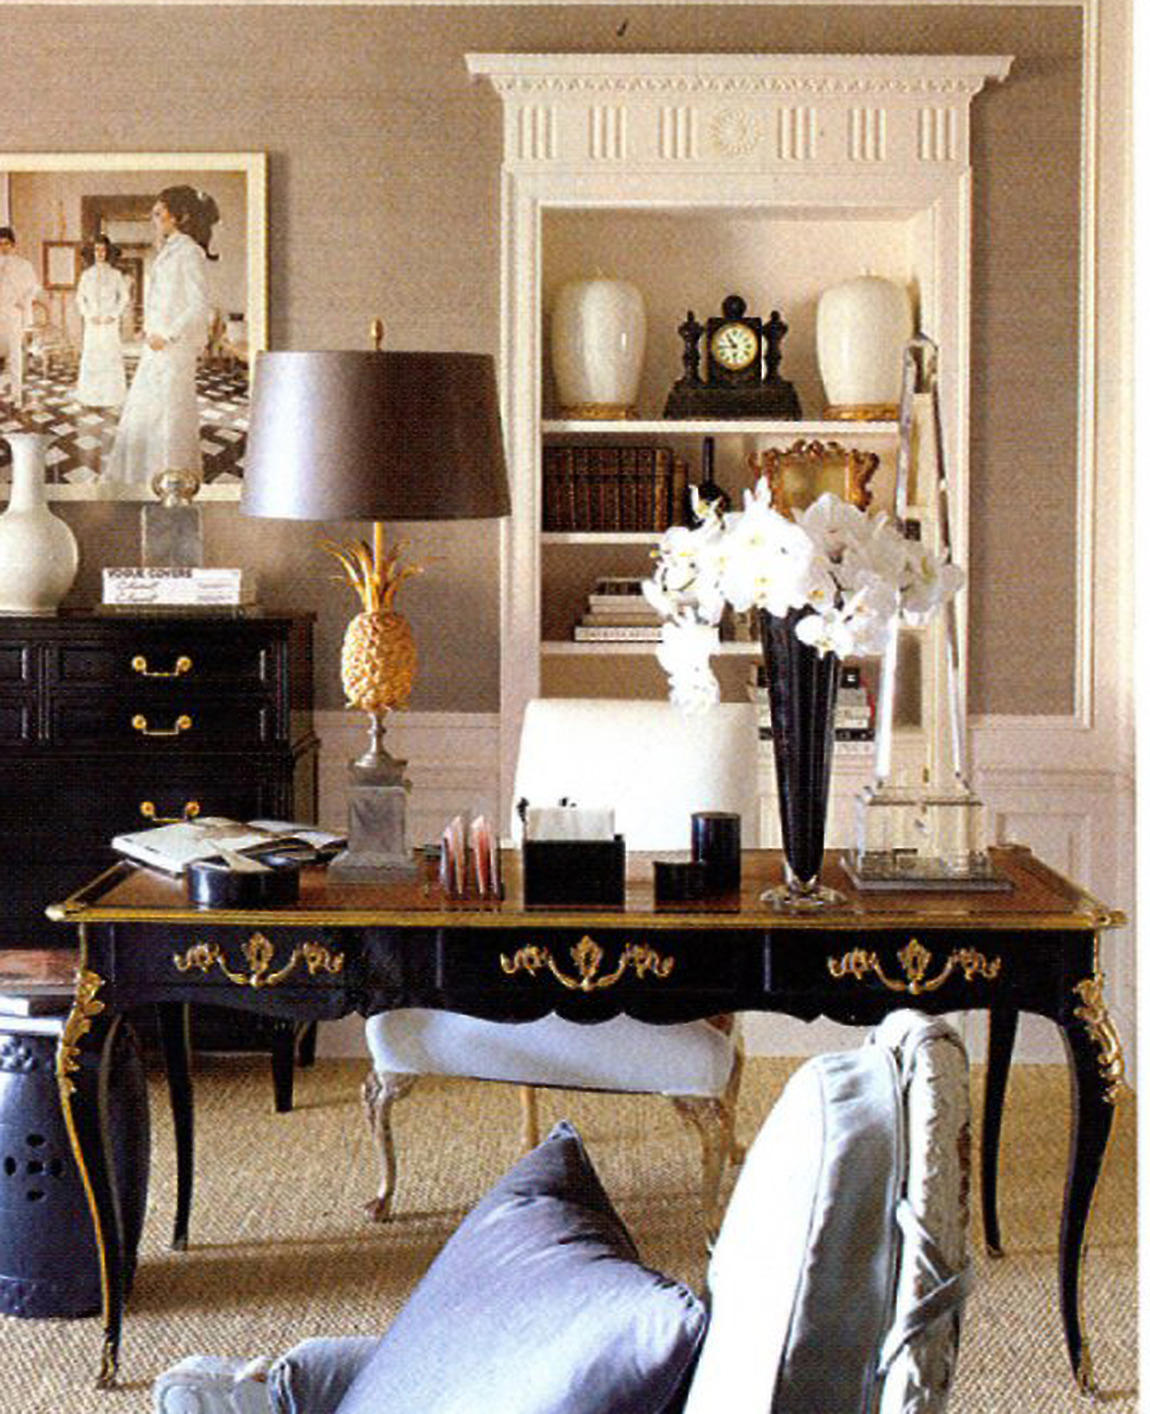 Designer-Gallery-%E2%80%A2-Grasscloth-%E2%80%A2-Natural-Wallcoverings-%E2%80%A2-Phillip-Jeffries-Ltd-wallpaper-wp5404502